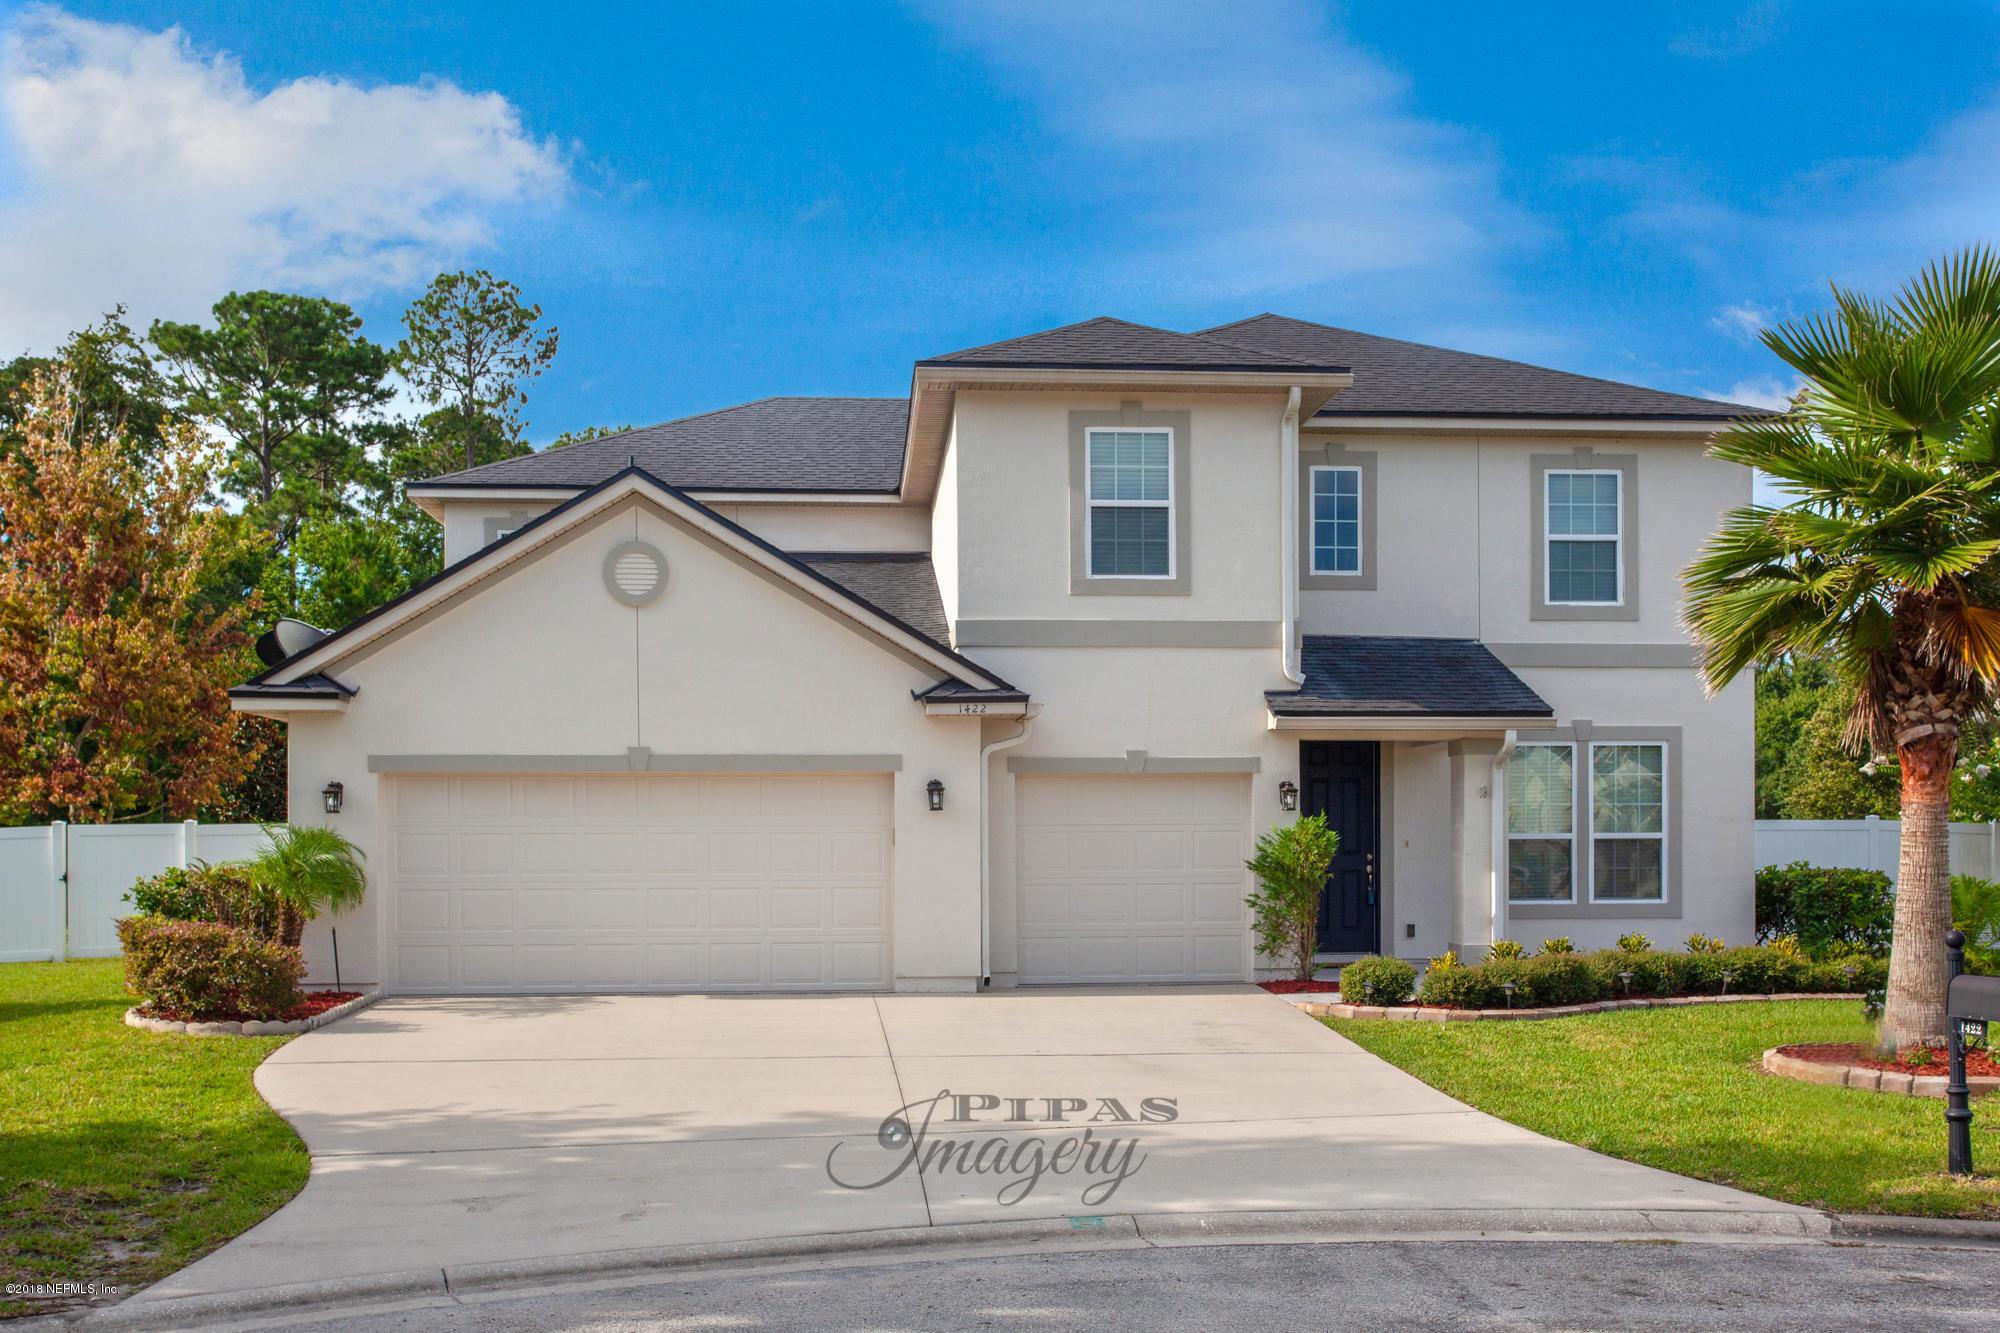 1422 TALON, FLEMING ISLAND, FLORIDA 32003, 5 Bedrooms Bedrooms, ,4 BathroomsBathrooms,Residential - single family,For sale,TALON,954991